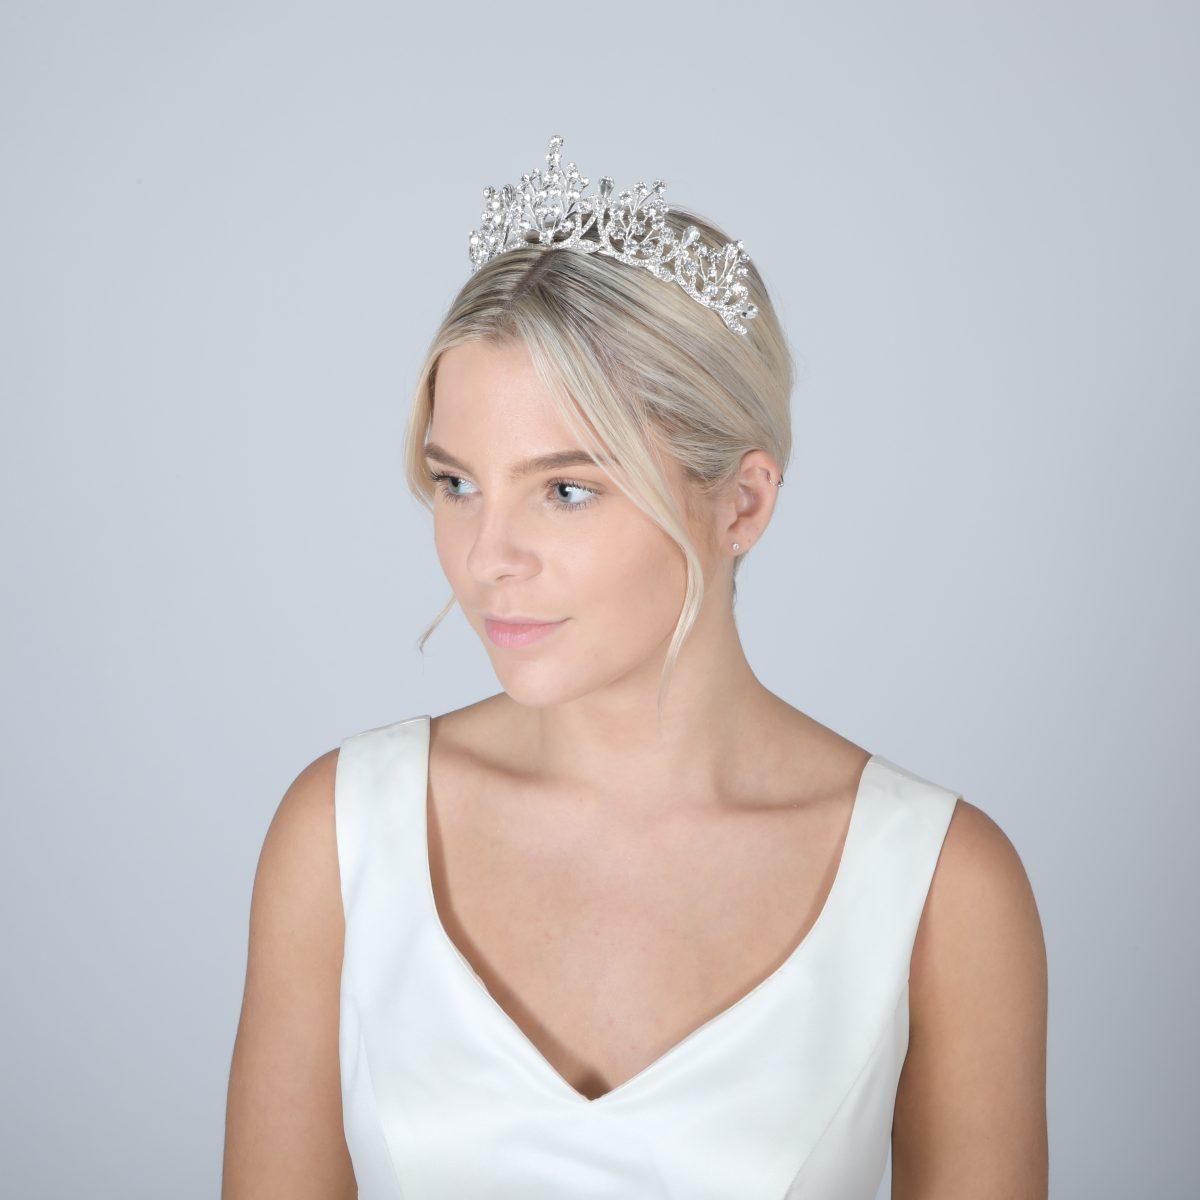 Perfect Bridal Crown - PBT5020 2